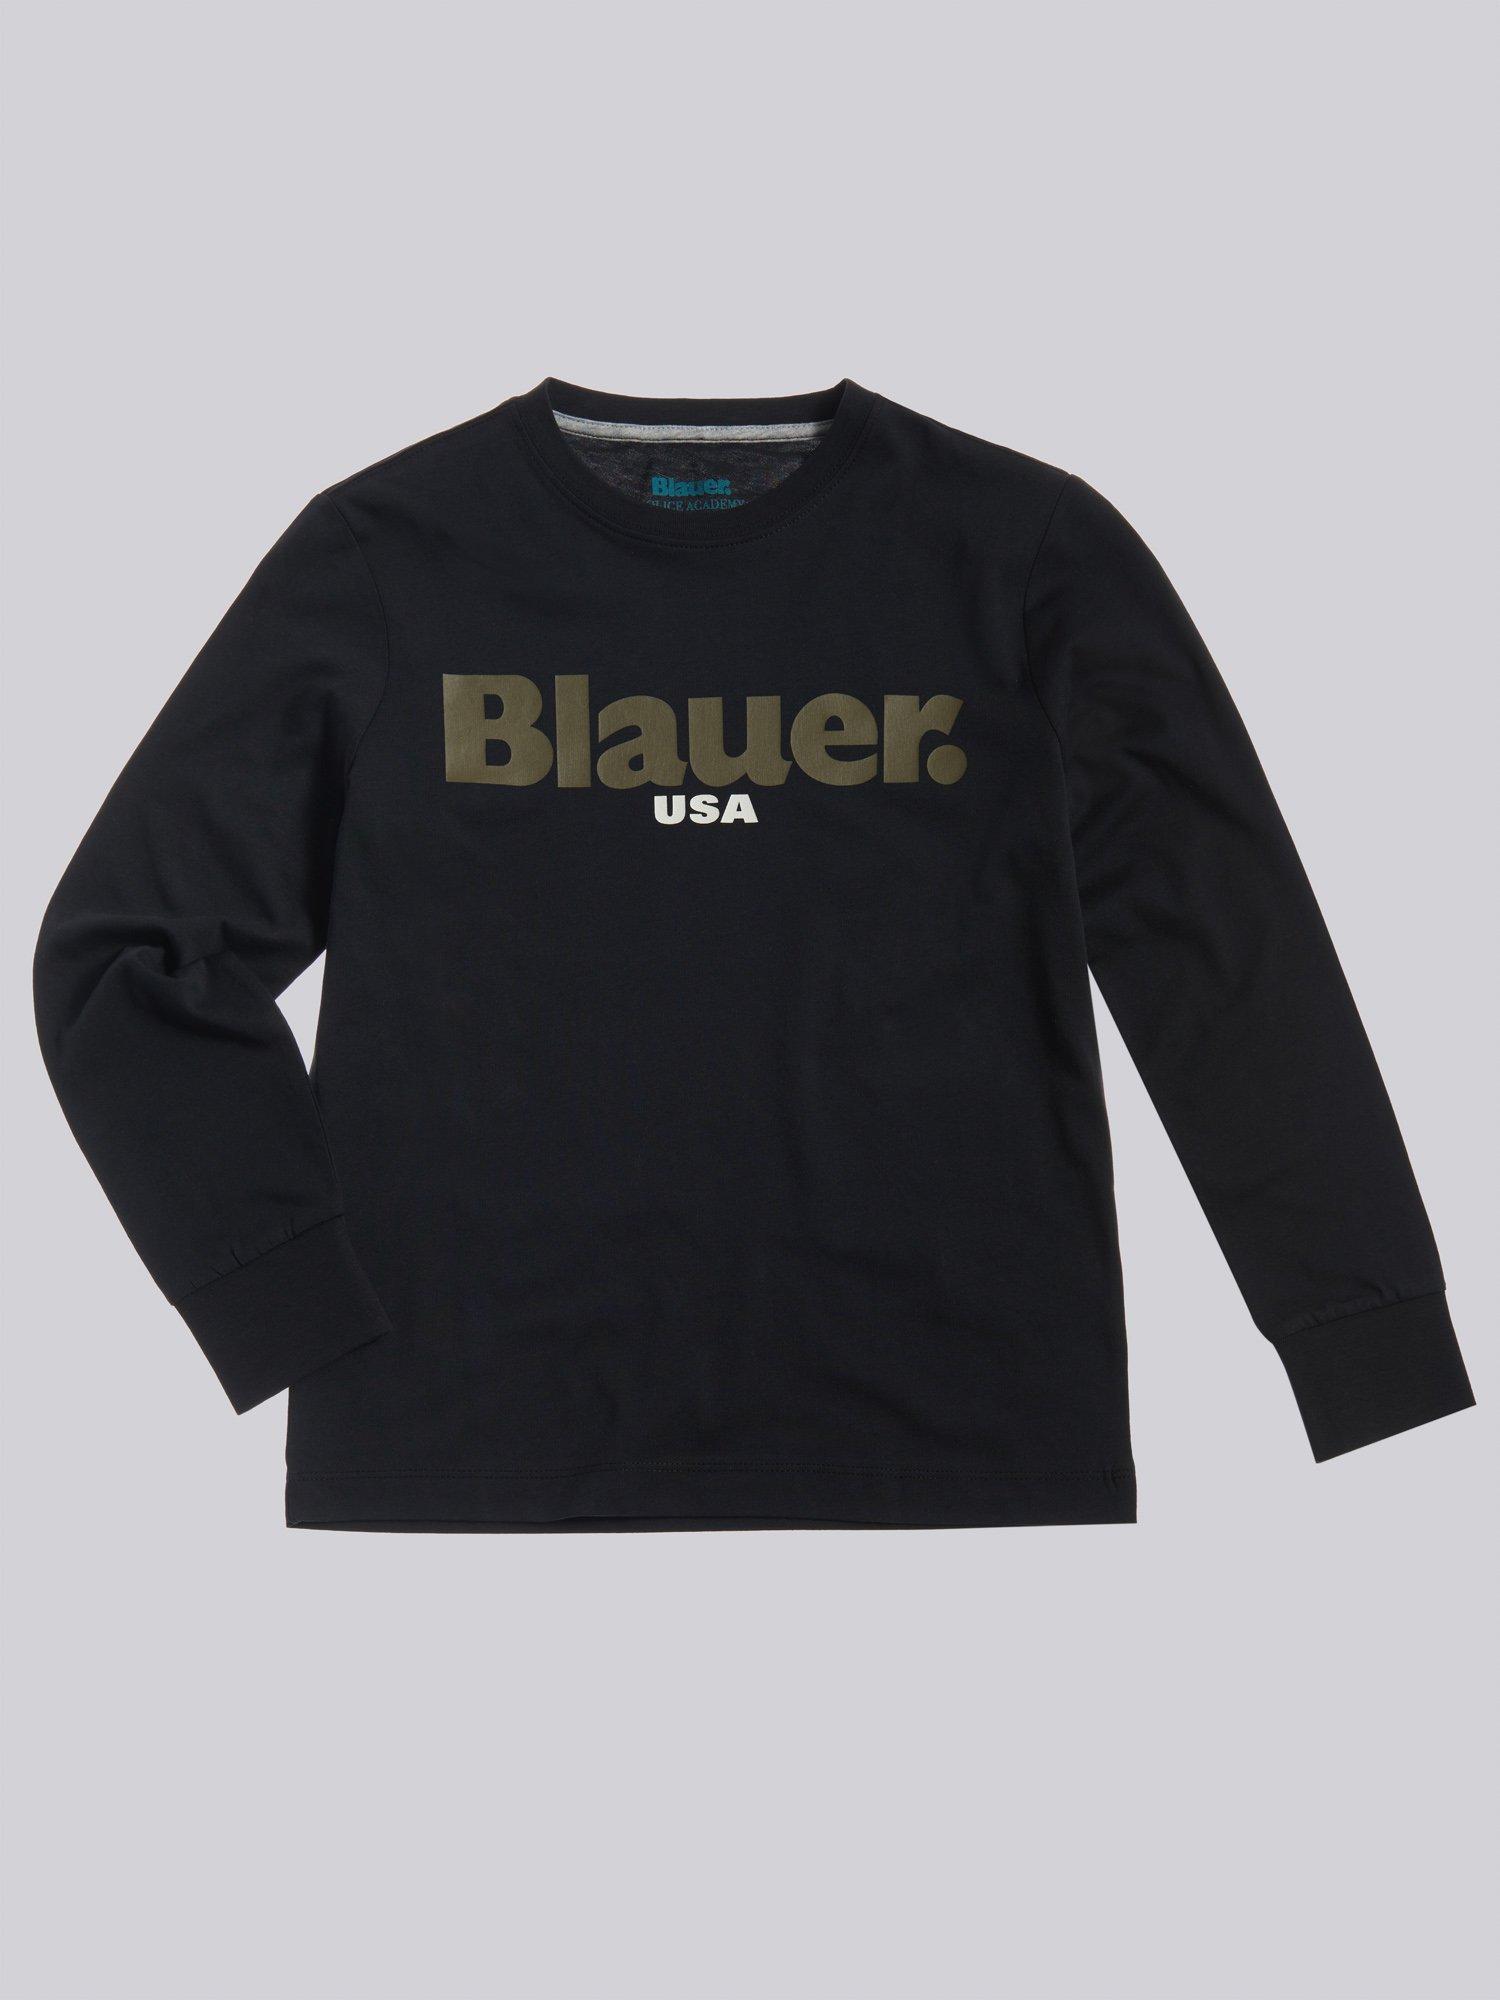 LANGARM-T-SHIRT BLAUER - Blauer